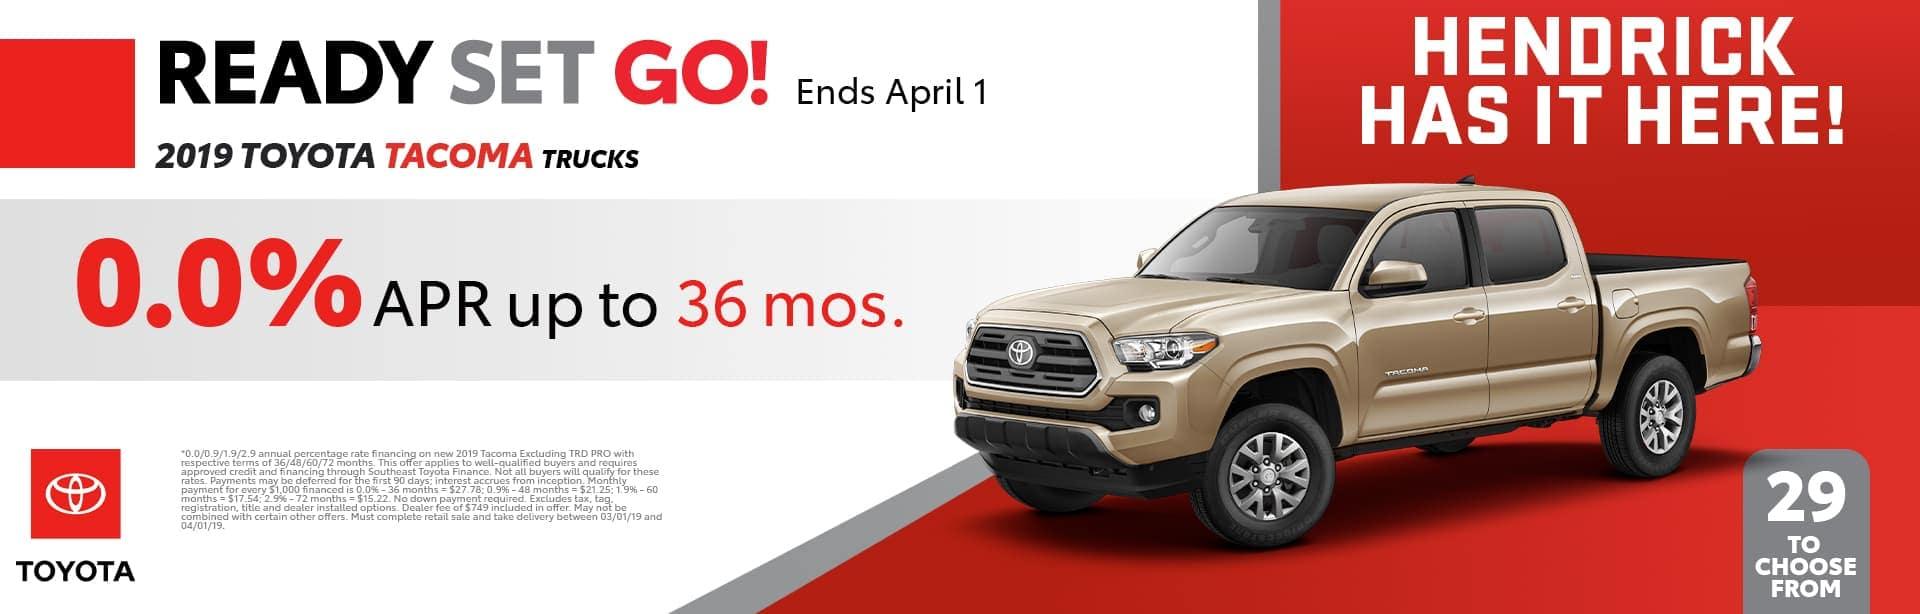 2019 Toyota Tacoma Trucks promo banner